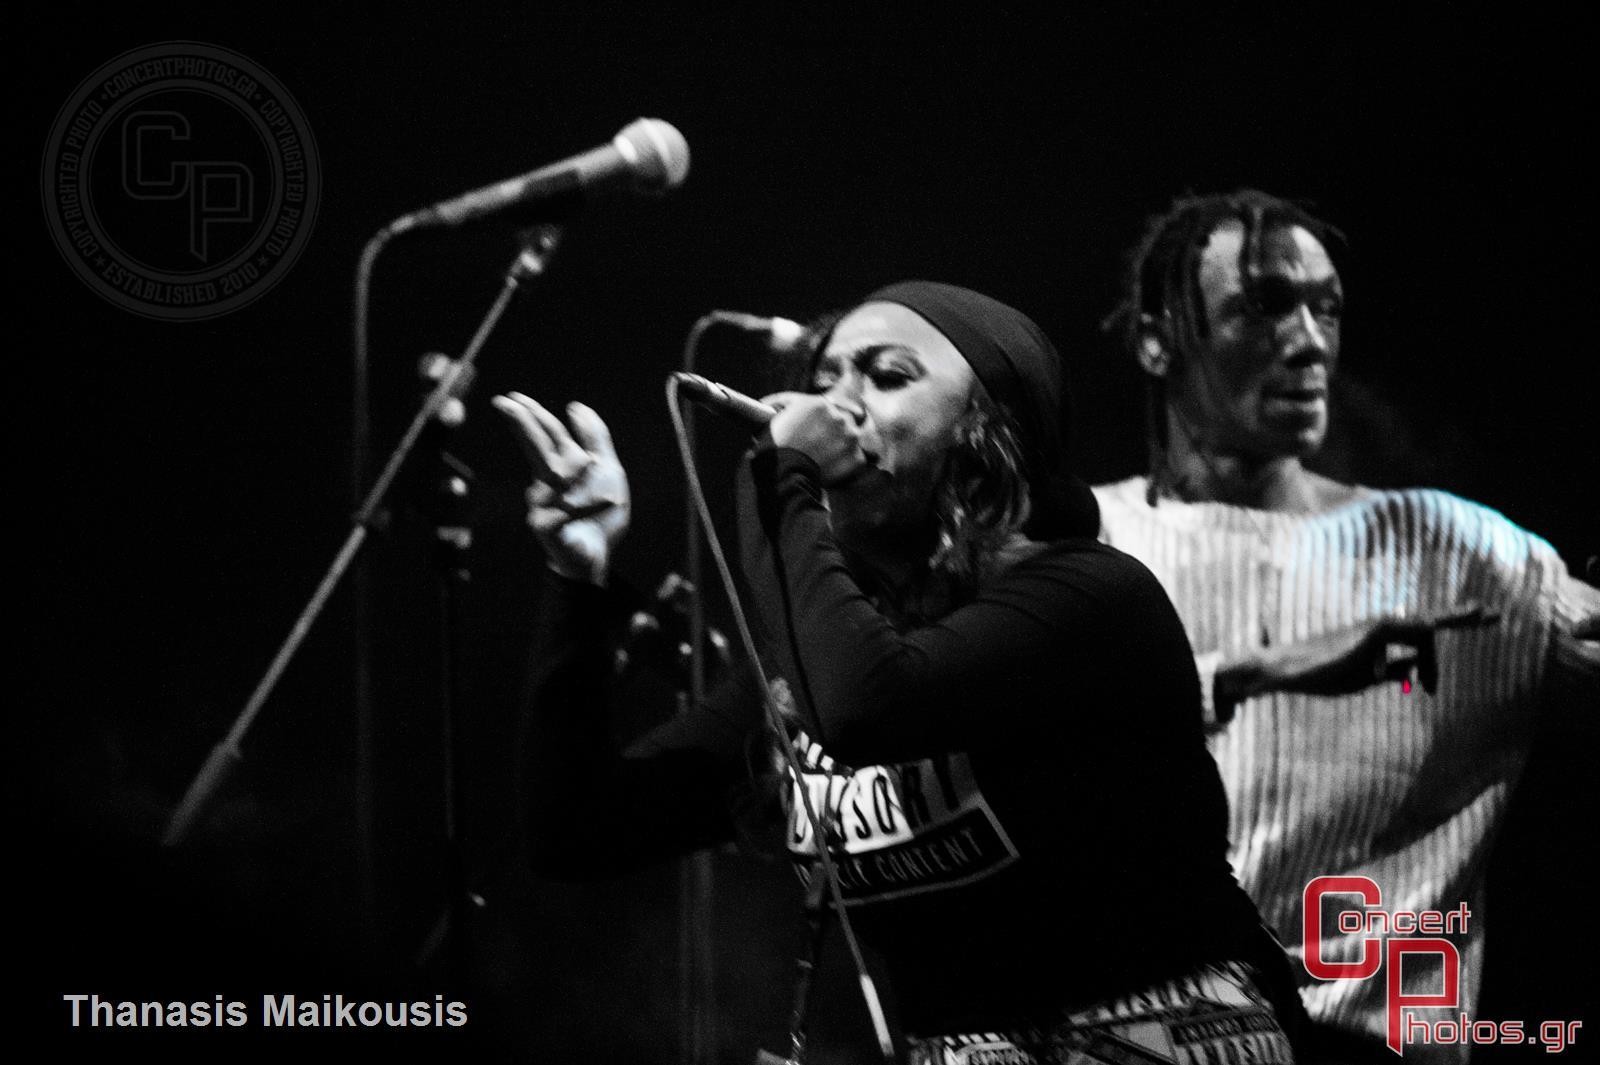 Tricky - Spectralfire-Tricky - Spectralfire photographer: Thanasis Maikousis - concertphotos_-3768